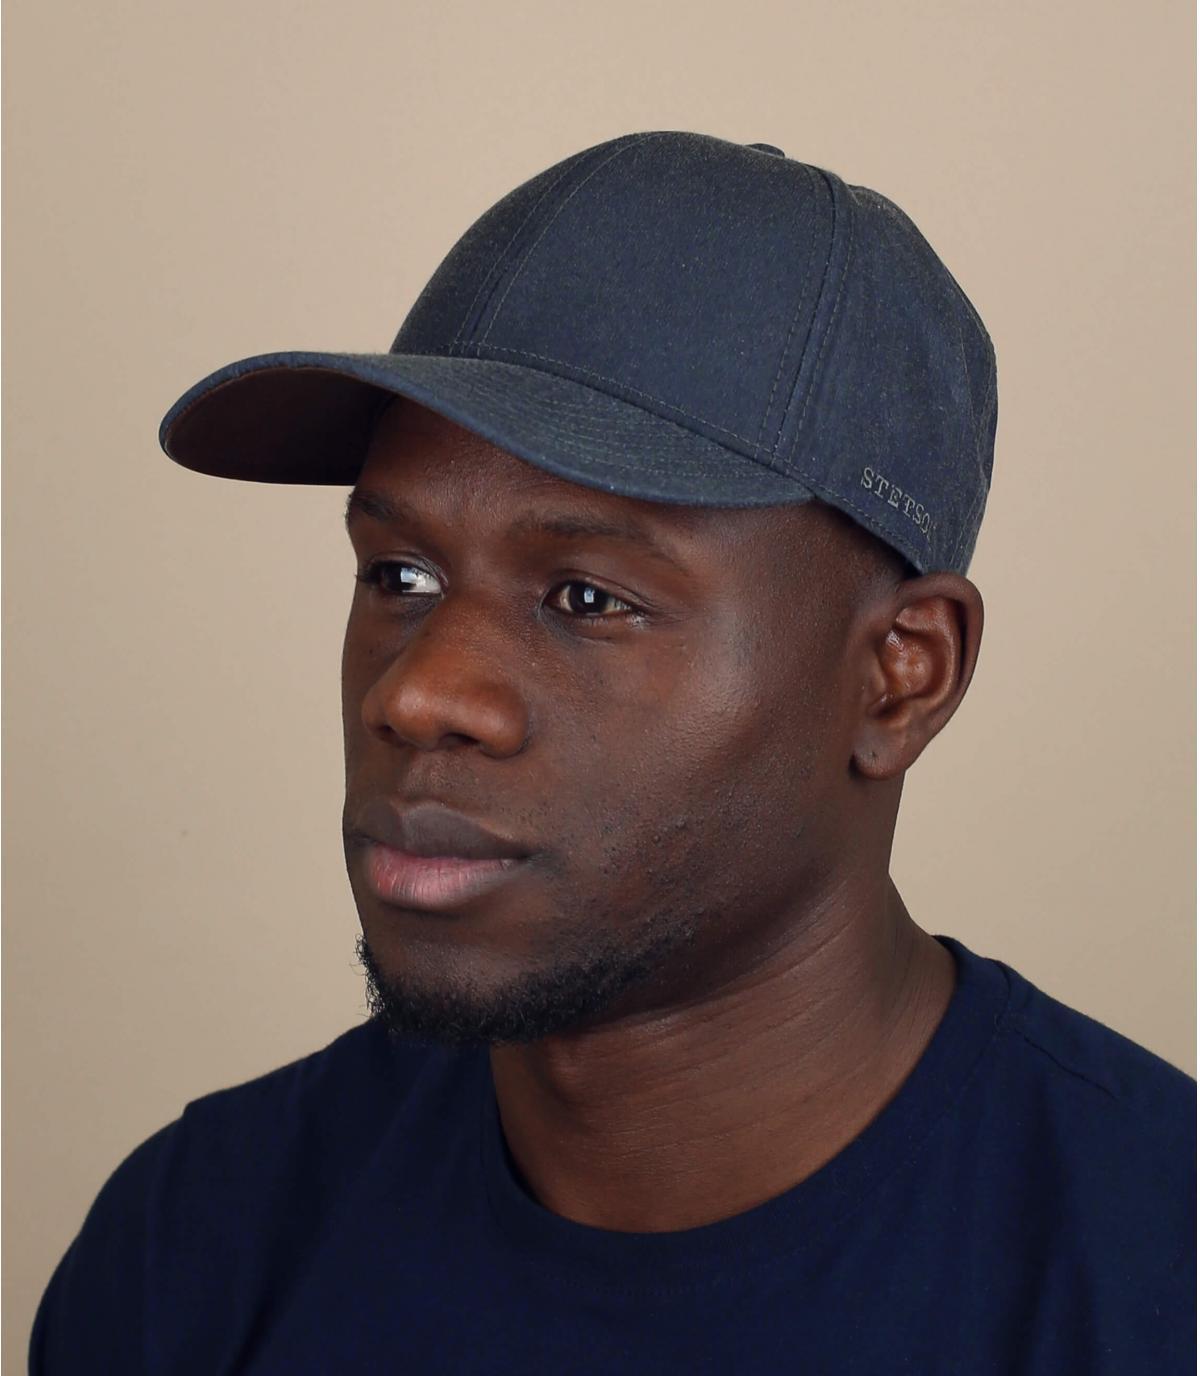 Cap wasserabweisend grau